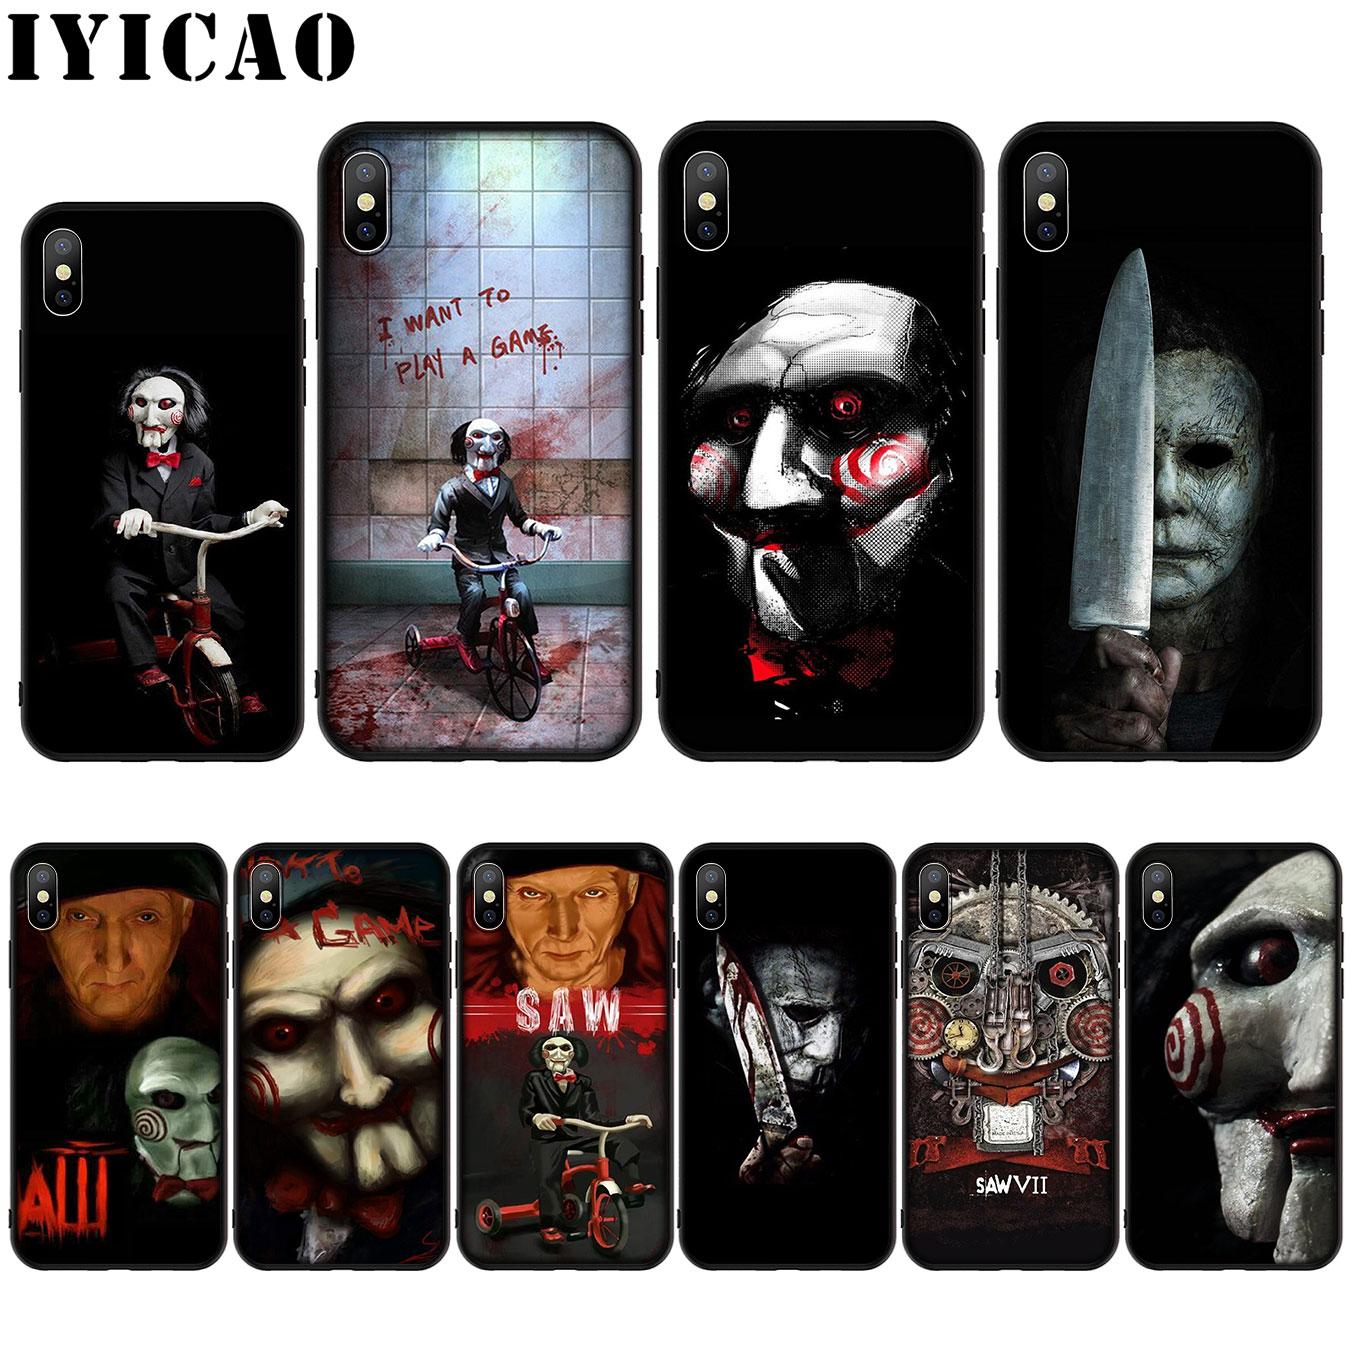 Goast iPhone 11 case